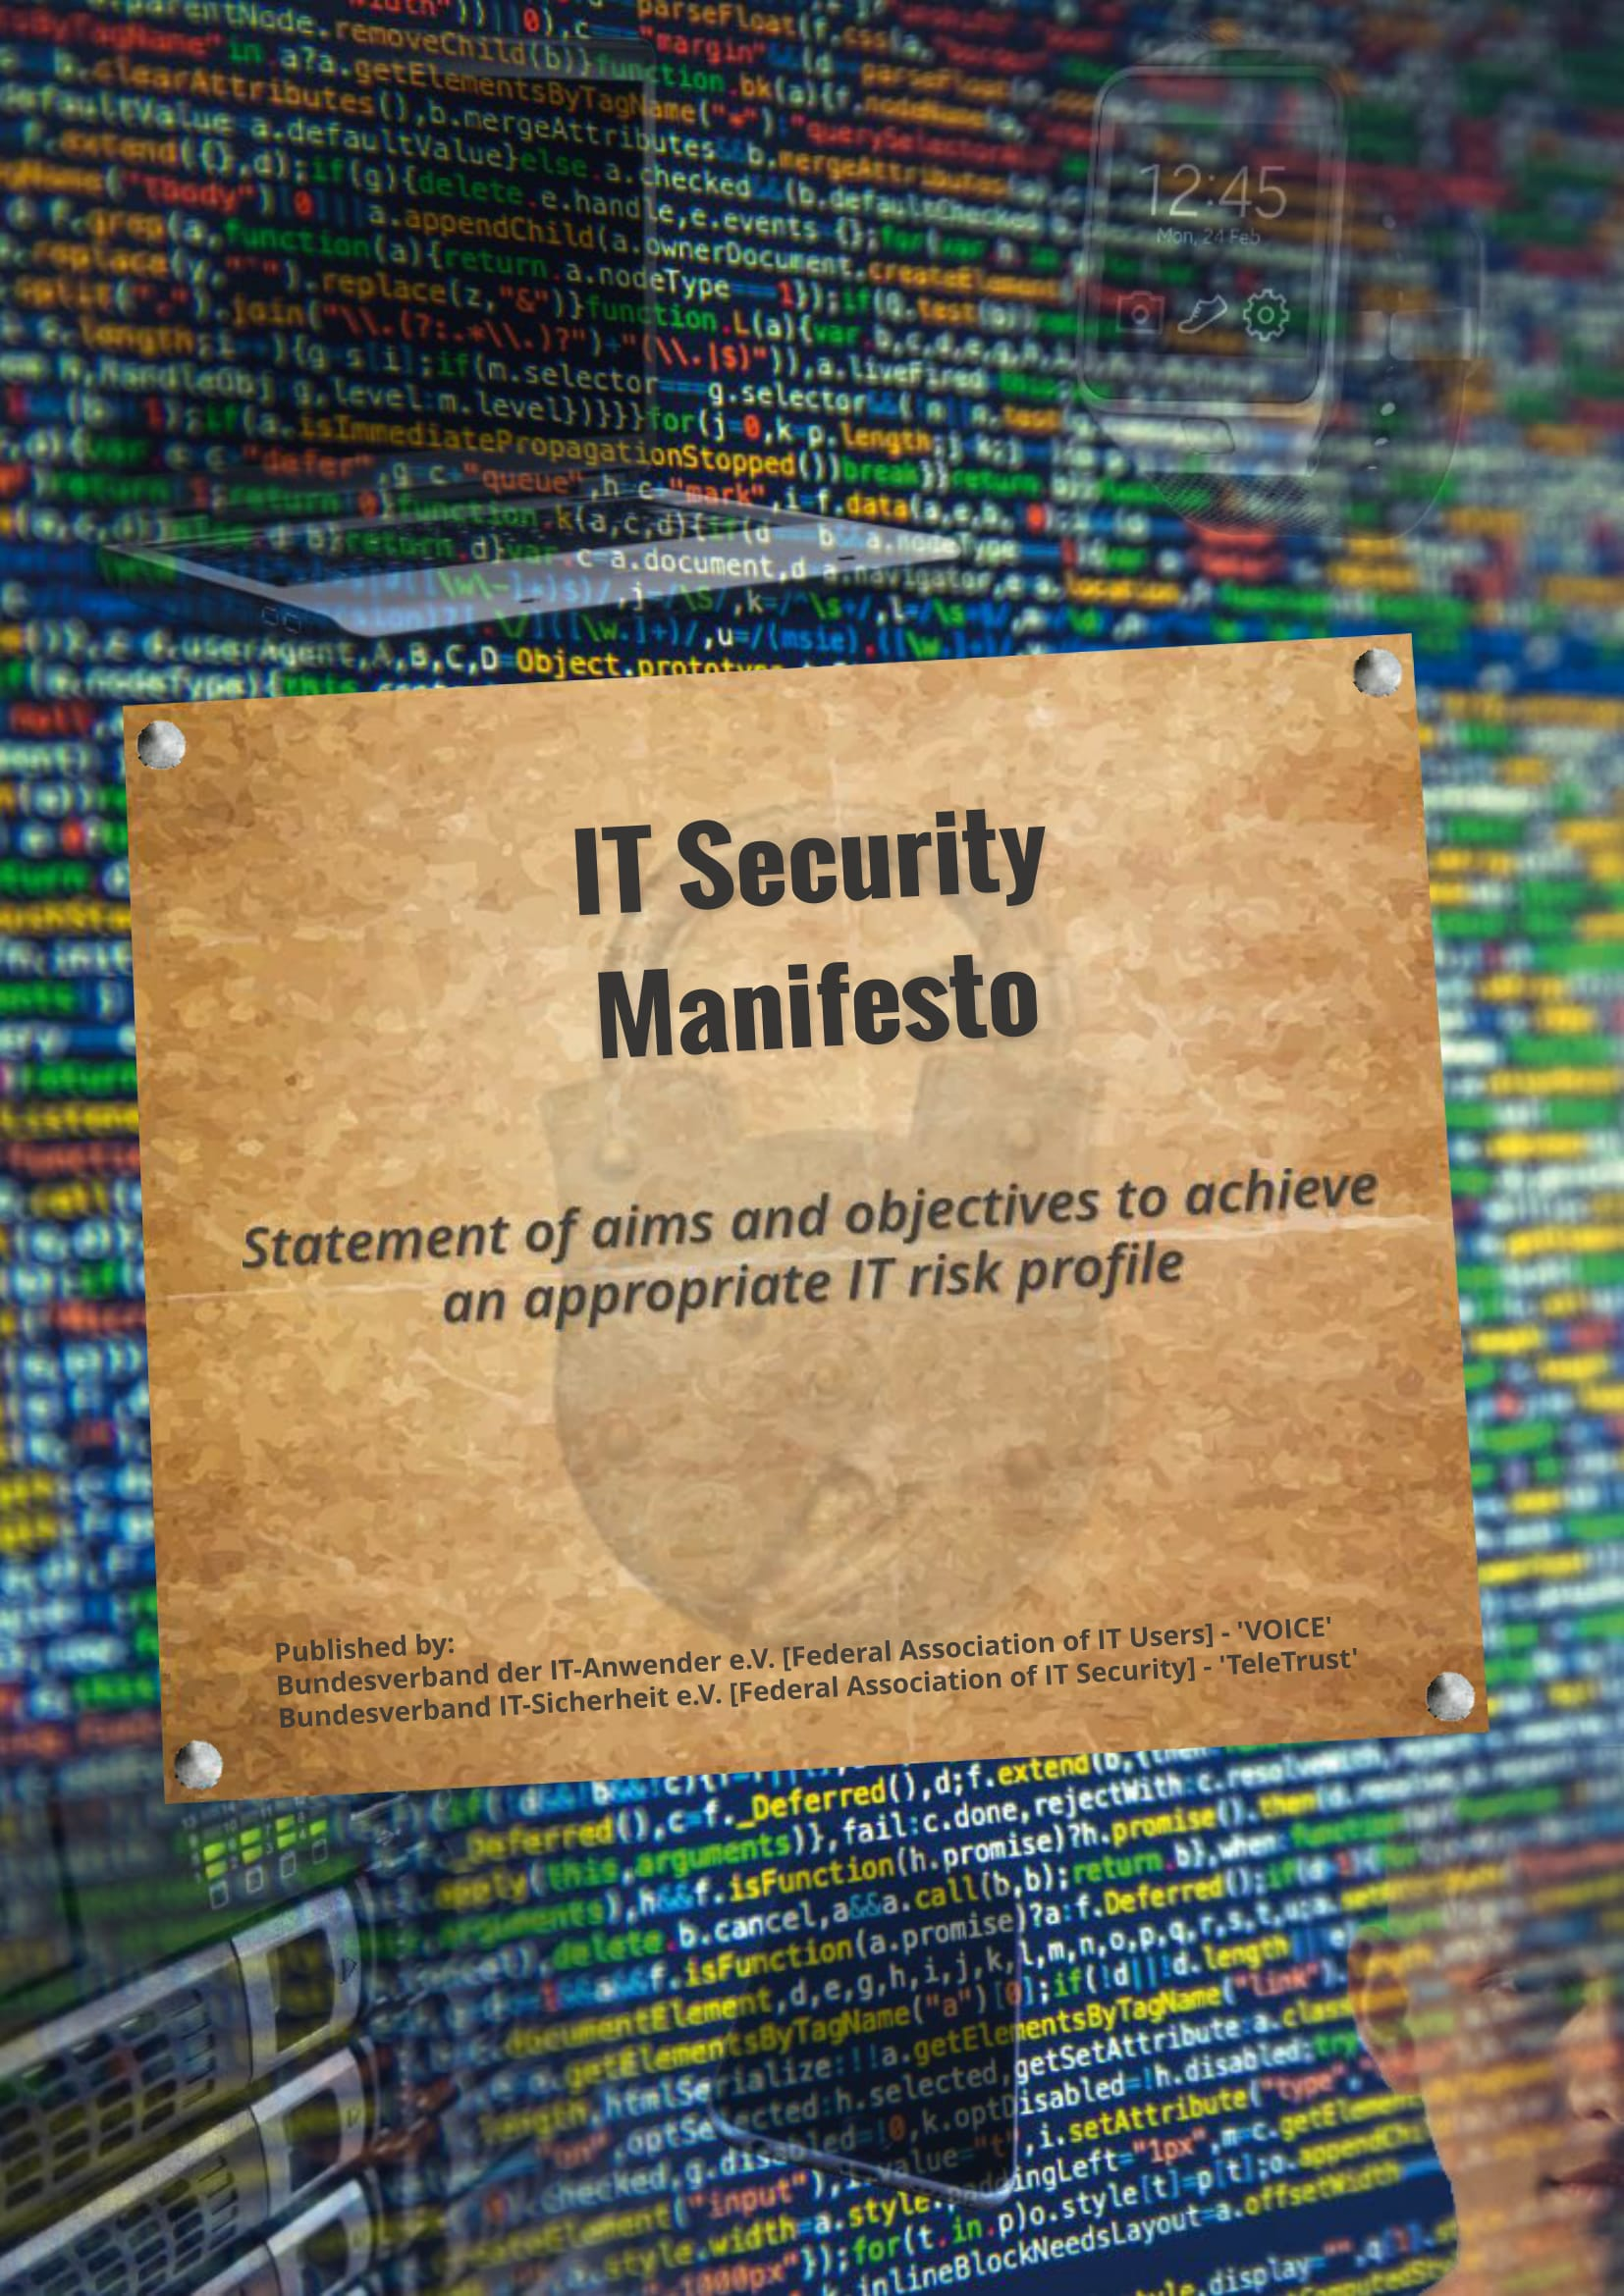 IT Security Manifesto